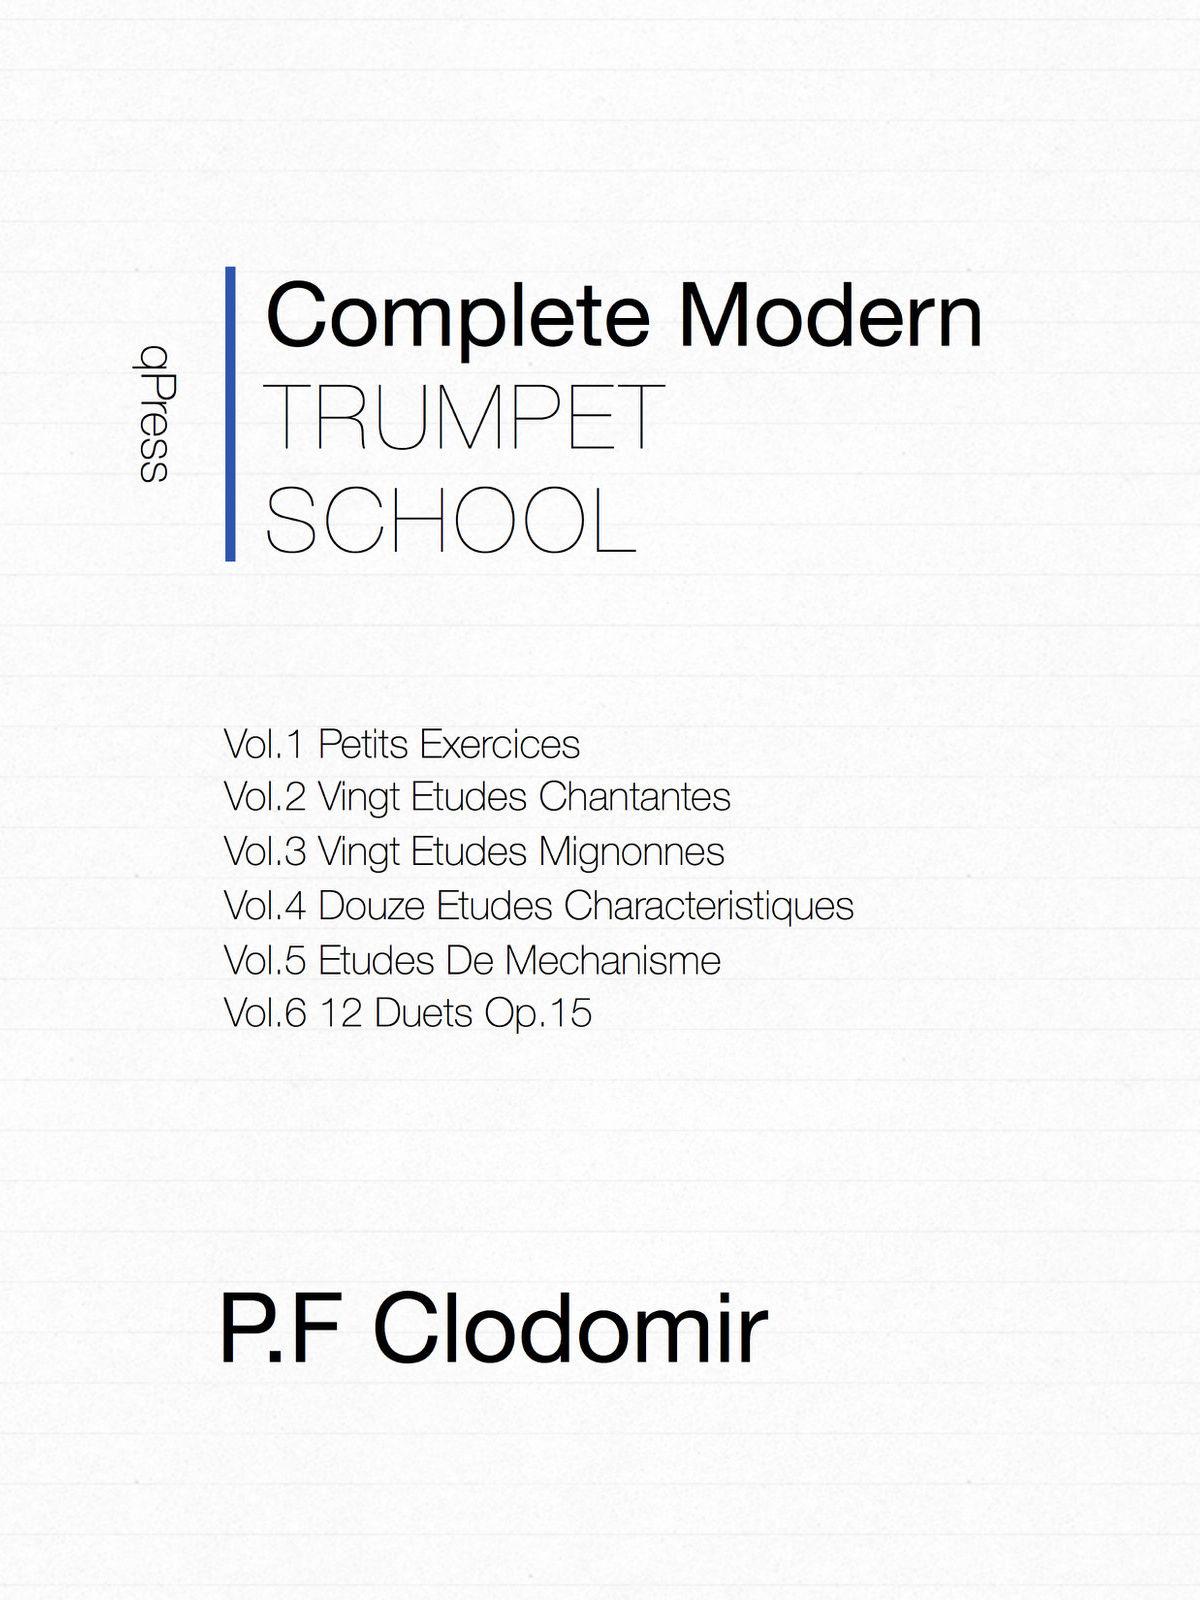 complete-modern-school-featured